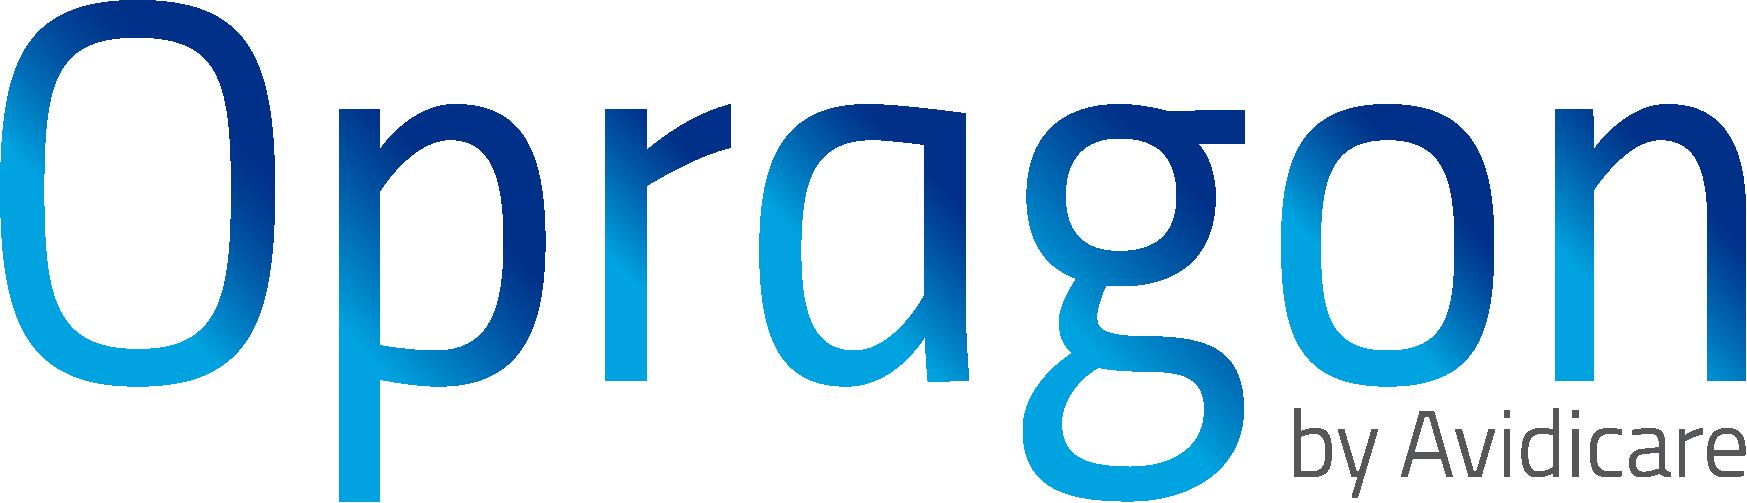 Opragon_logo_Colour_2018_highres.png